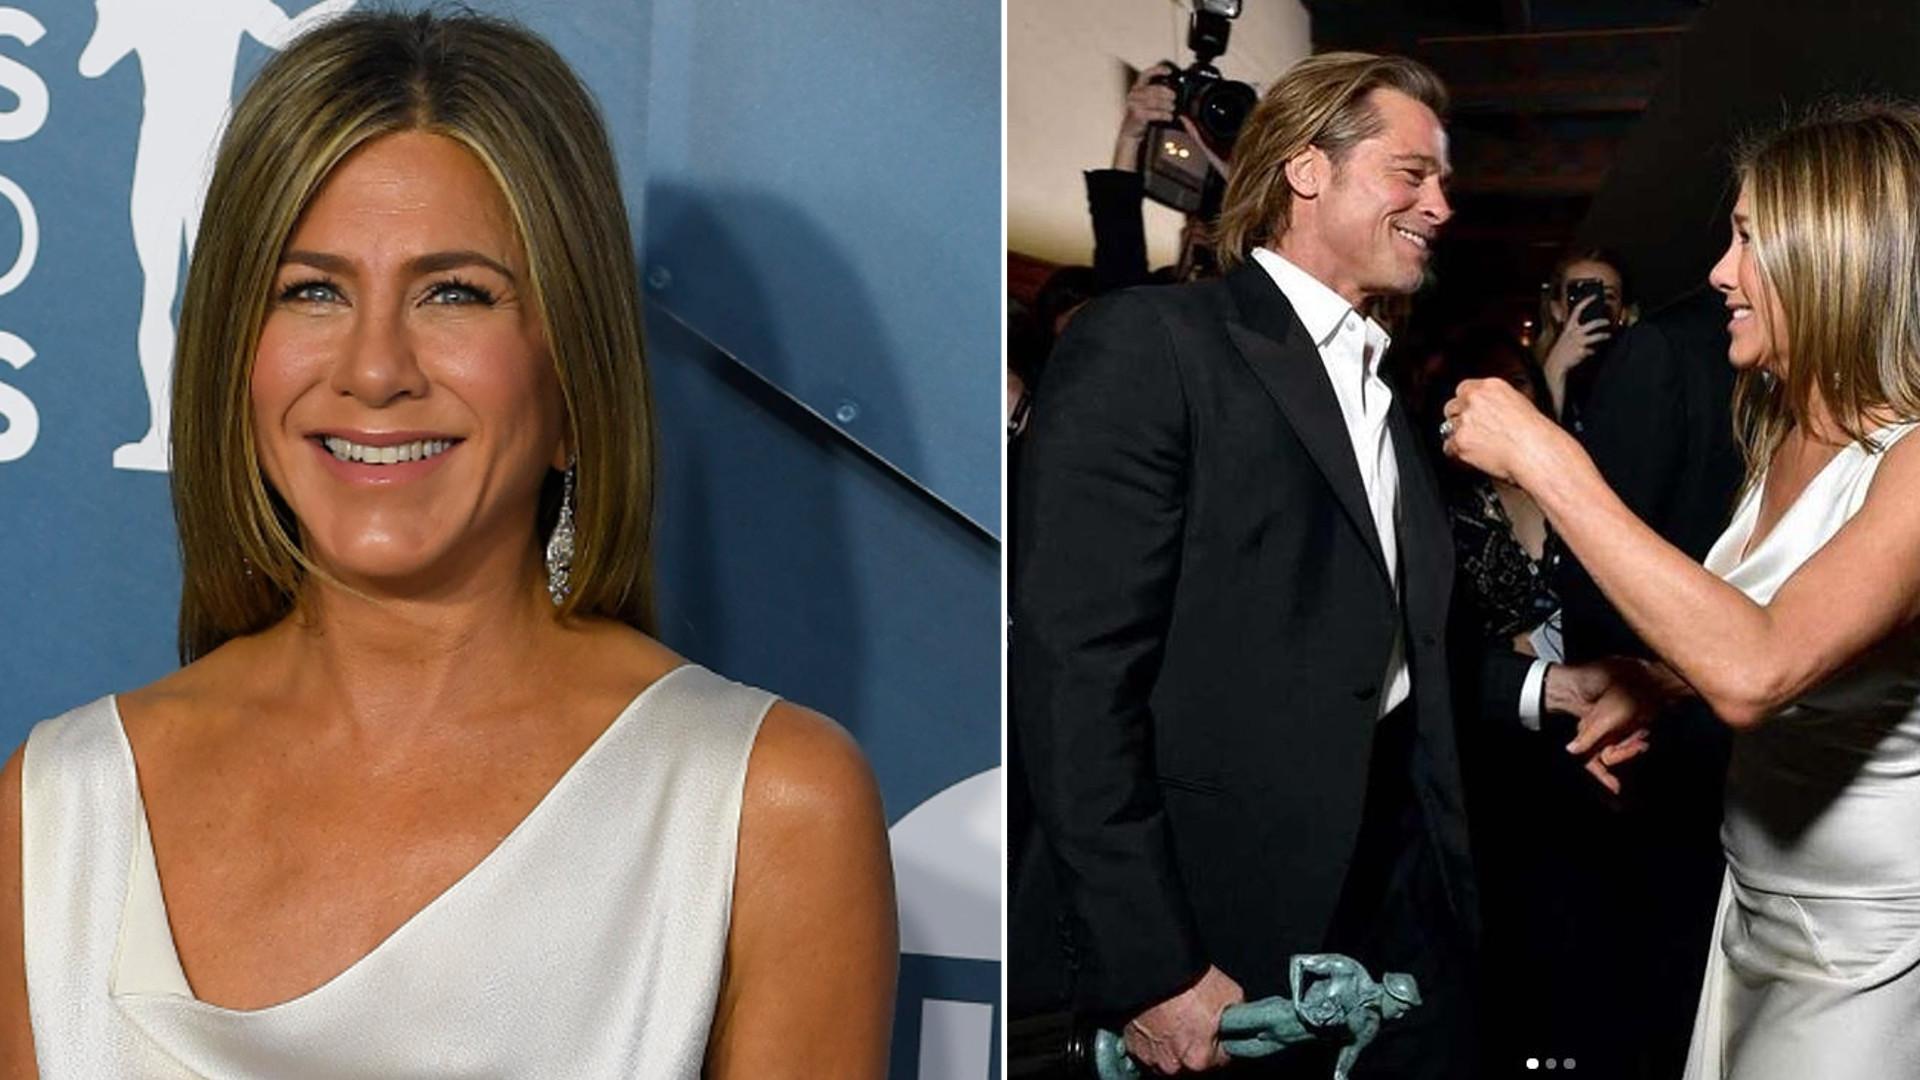 HIT! Jennifer Aniston i Brad Pitt ZA RĘKĘ na gali SAG (ZDJĘCIA)